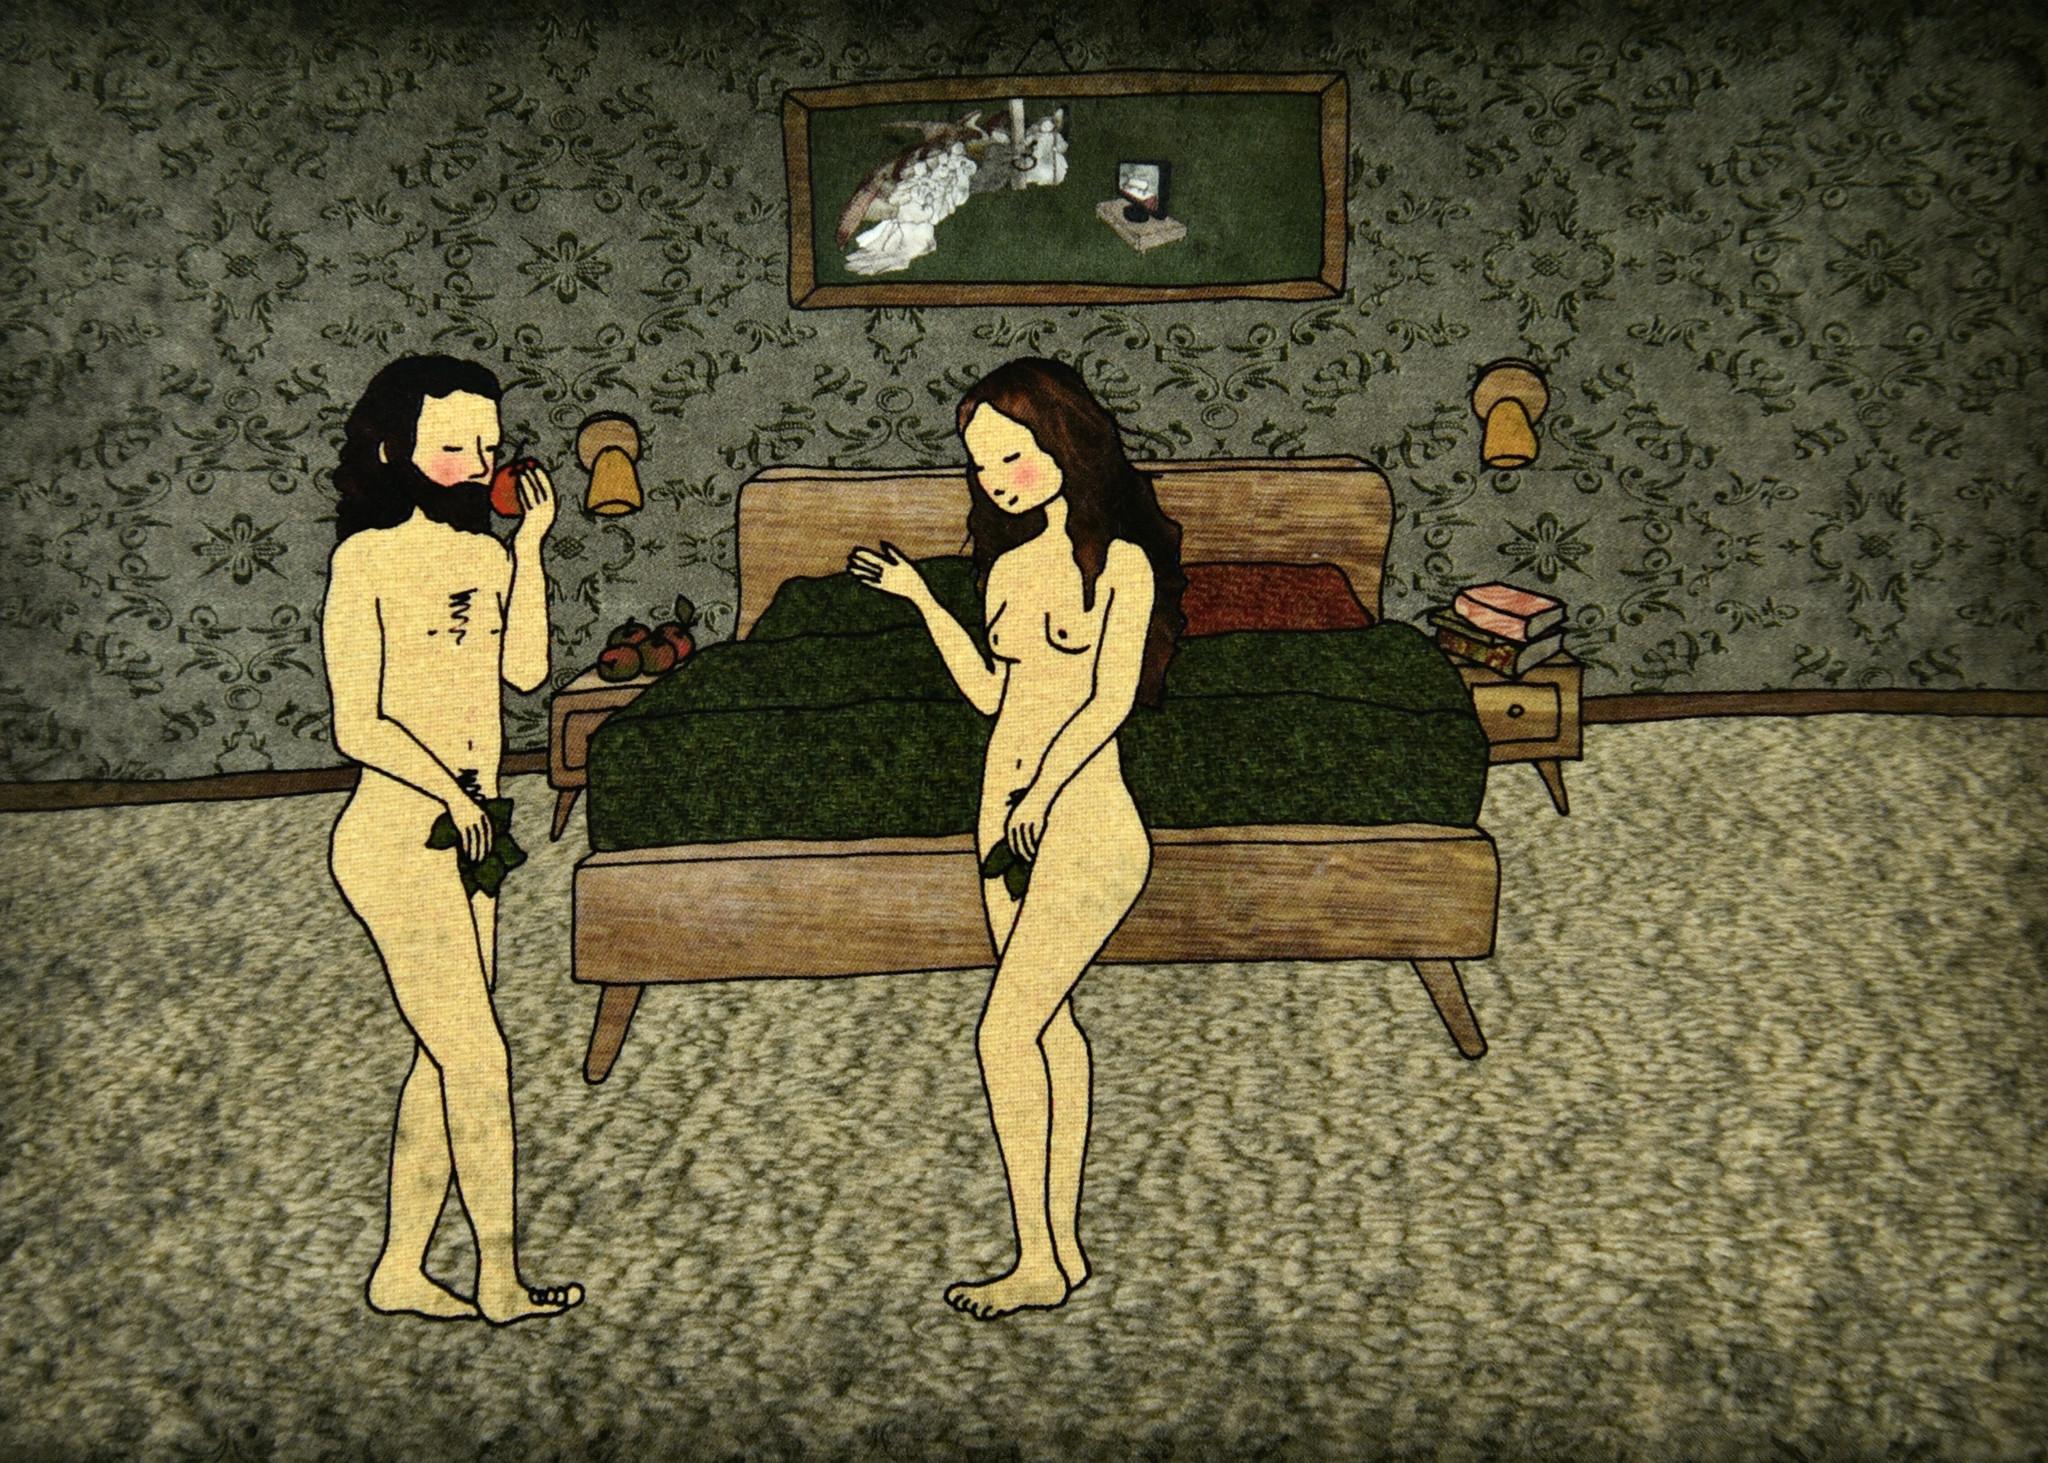 Tine De Groote Postcard Adam and Eve - Tine De Groote